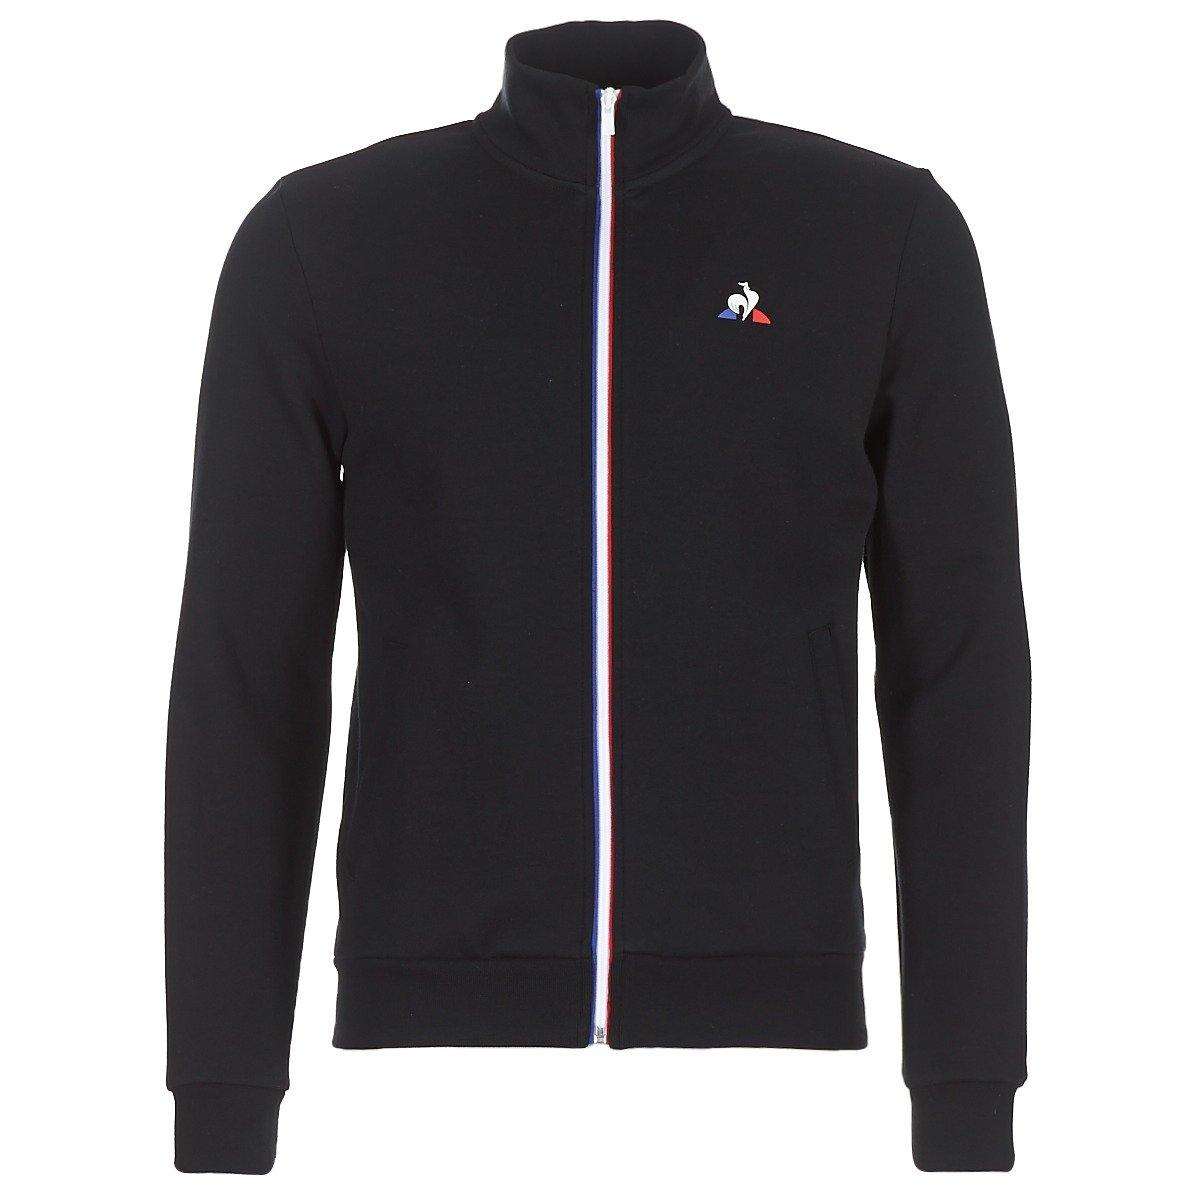 Le Coq Sportif Ess FZ No 1 Sweatshirt